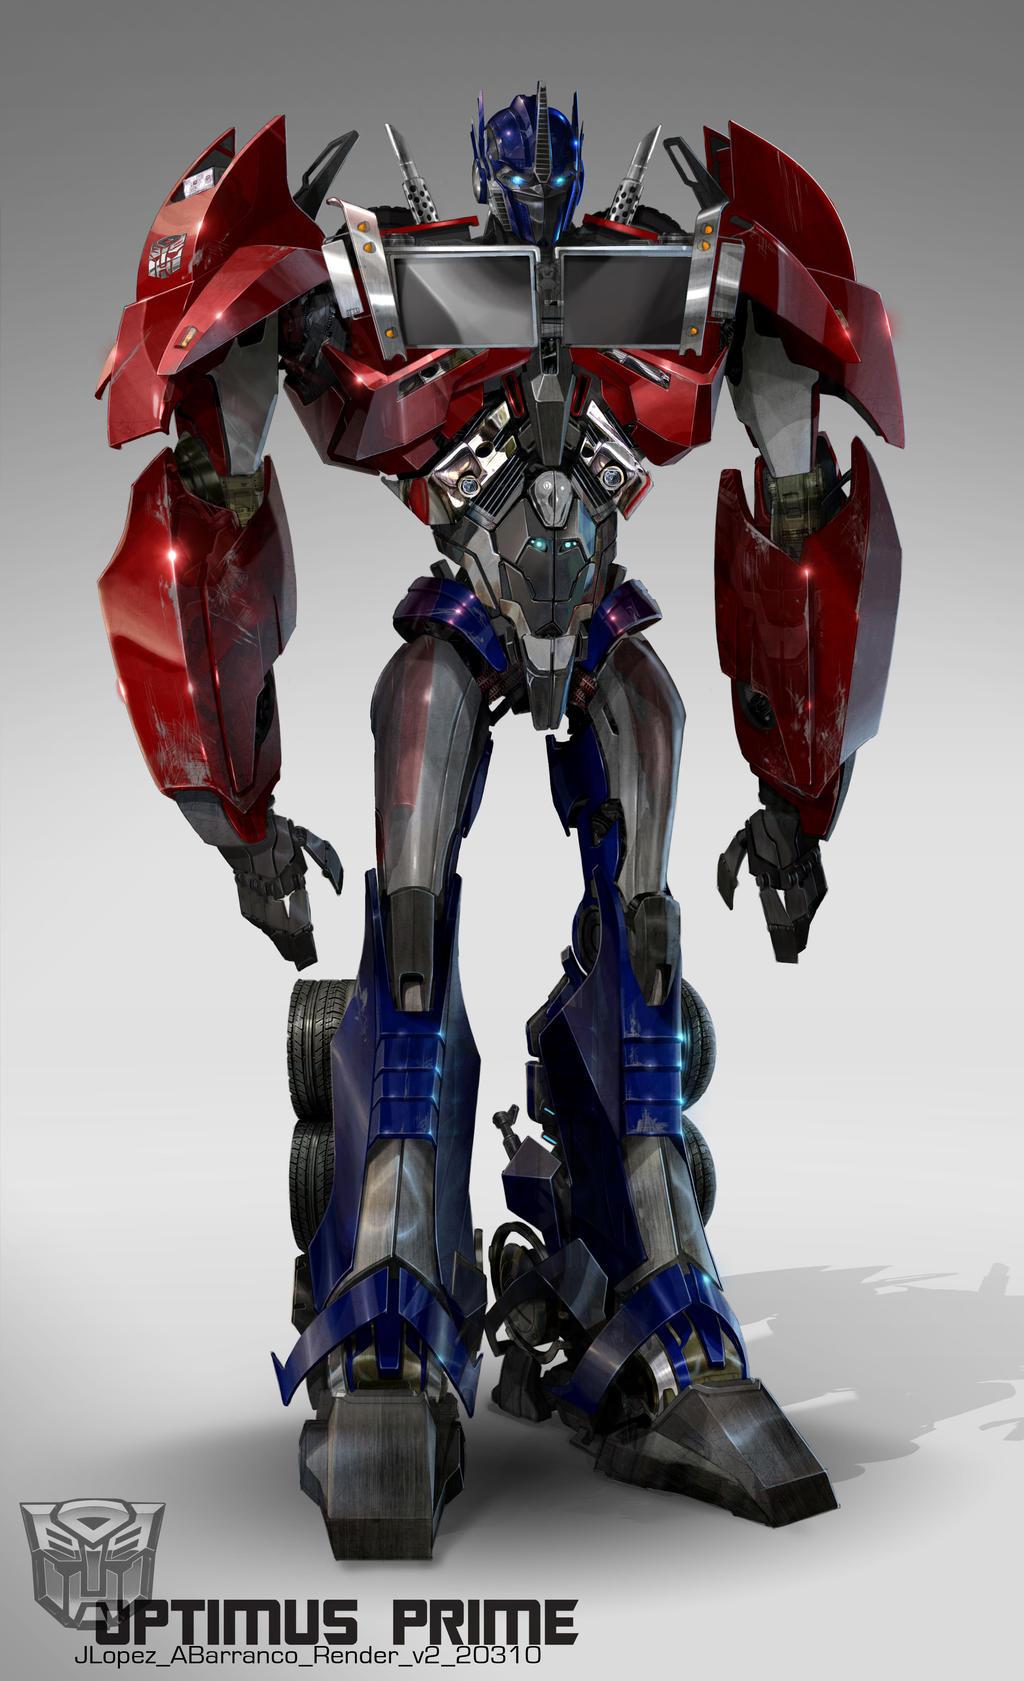 Tf optimus prime design v2 by augustobarranco on deviantart - Optimus prime dessin ...